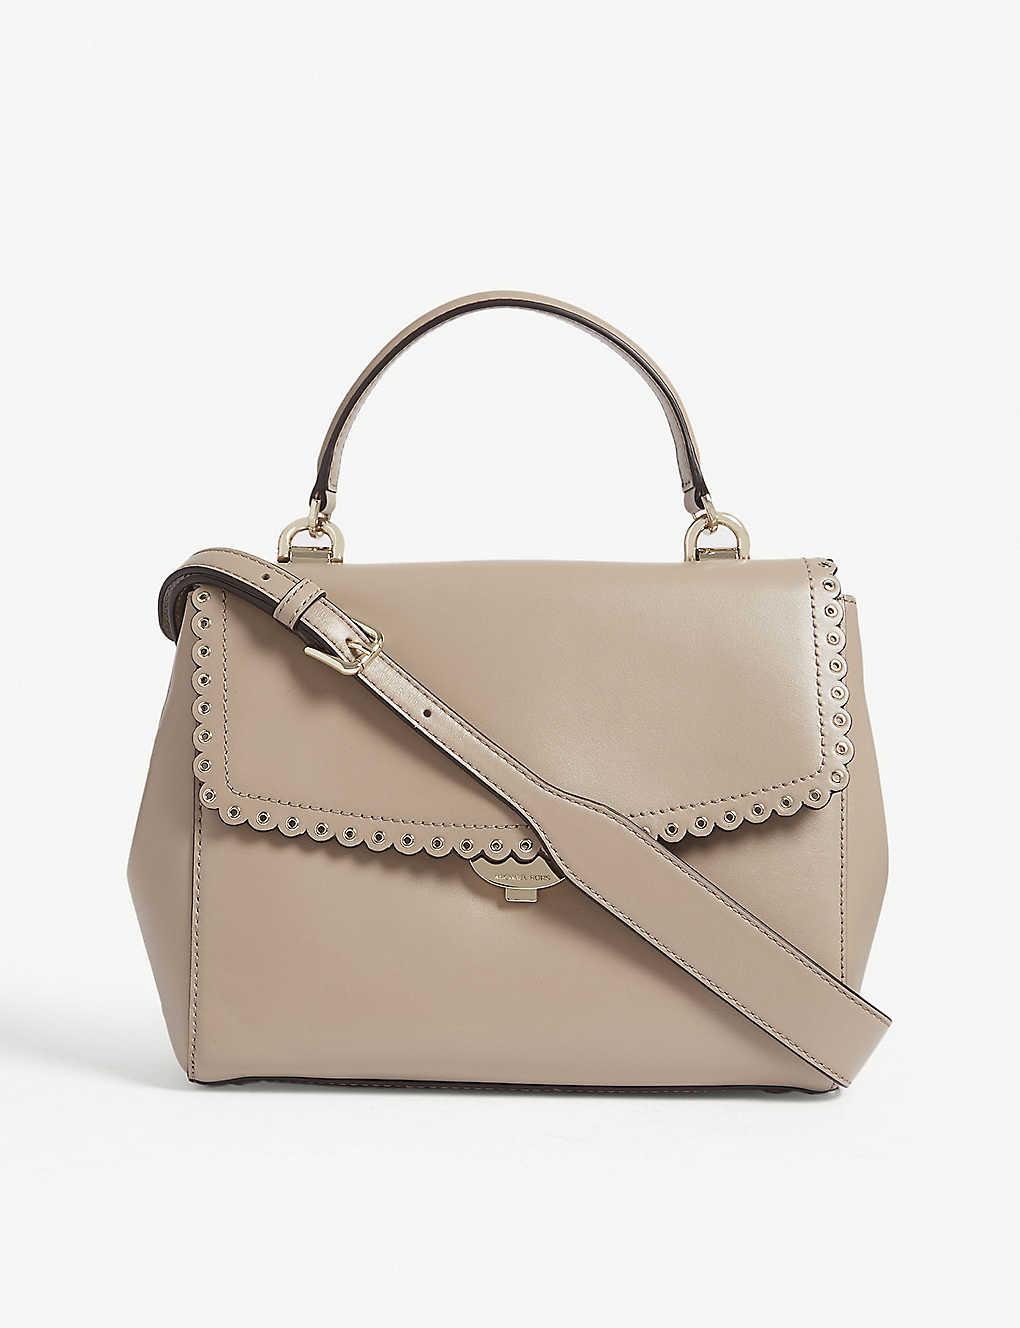 ab8f4d3d6131 MICHAEL MICHAEL KORS - Ava medium scalloped leather shoulder bag ...